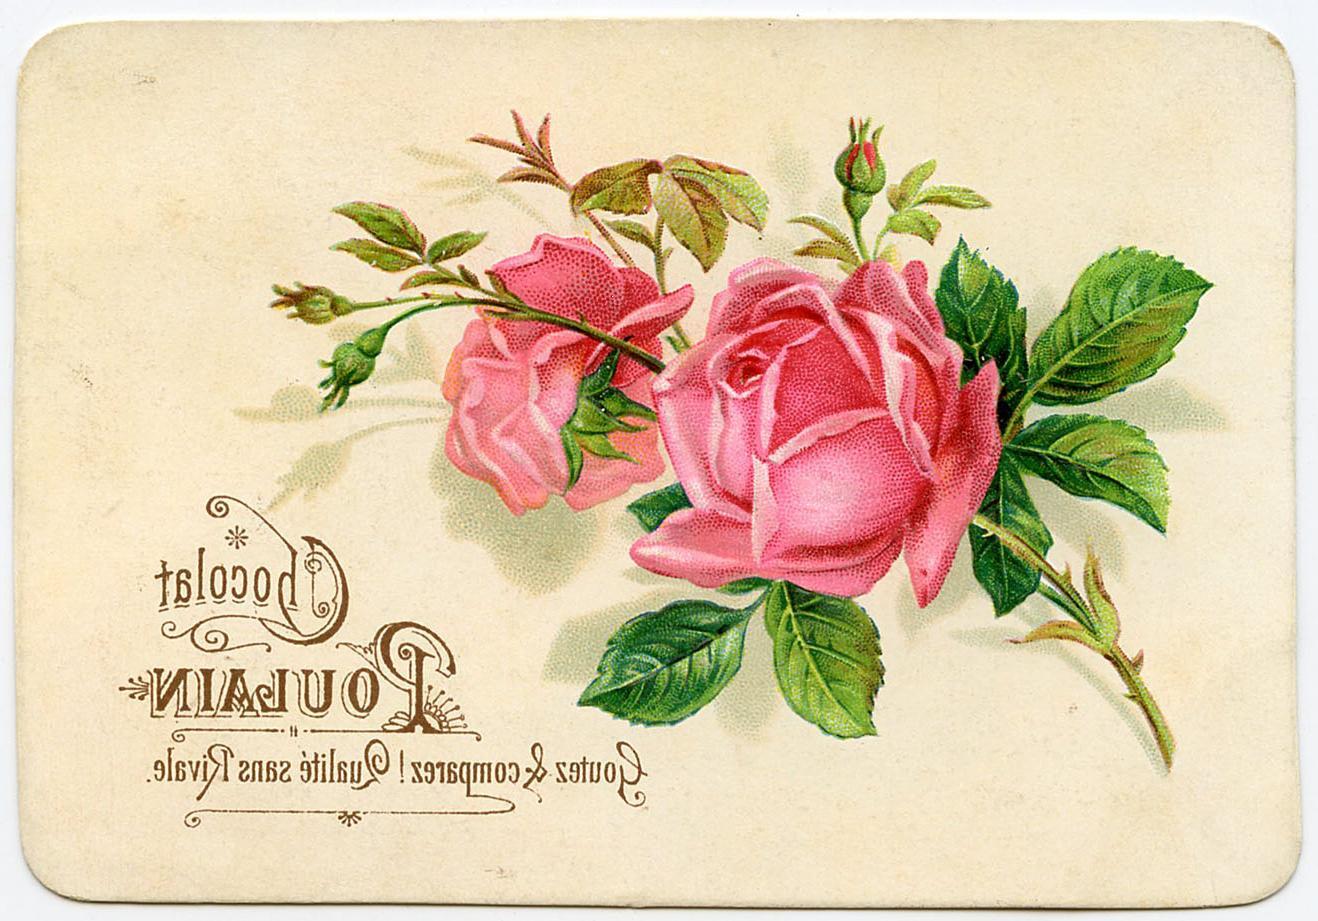 Pintura decorativa imagenes para transferencias sobre - Transferir fotos a madera ...